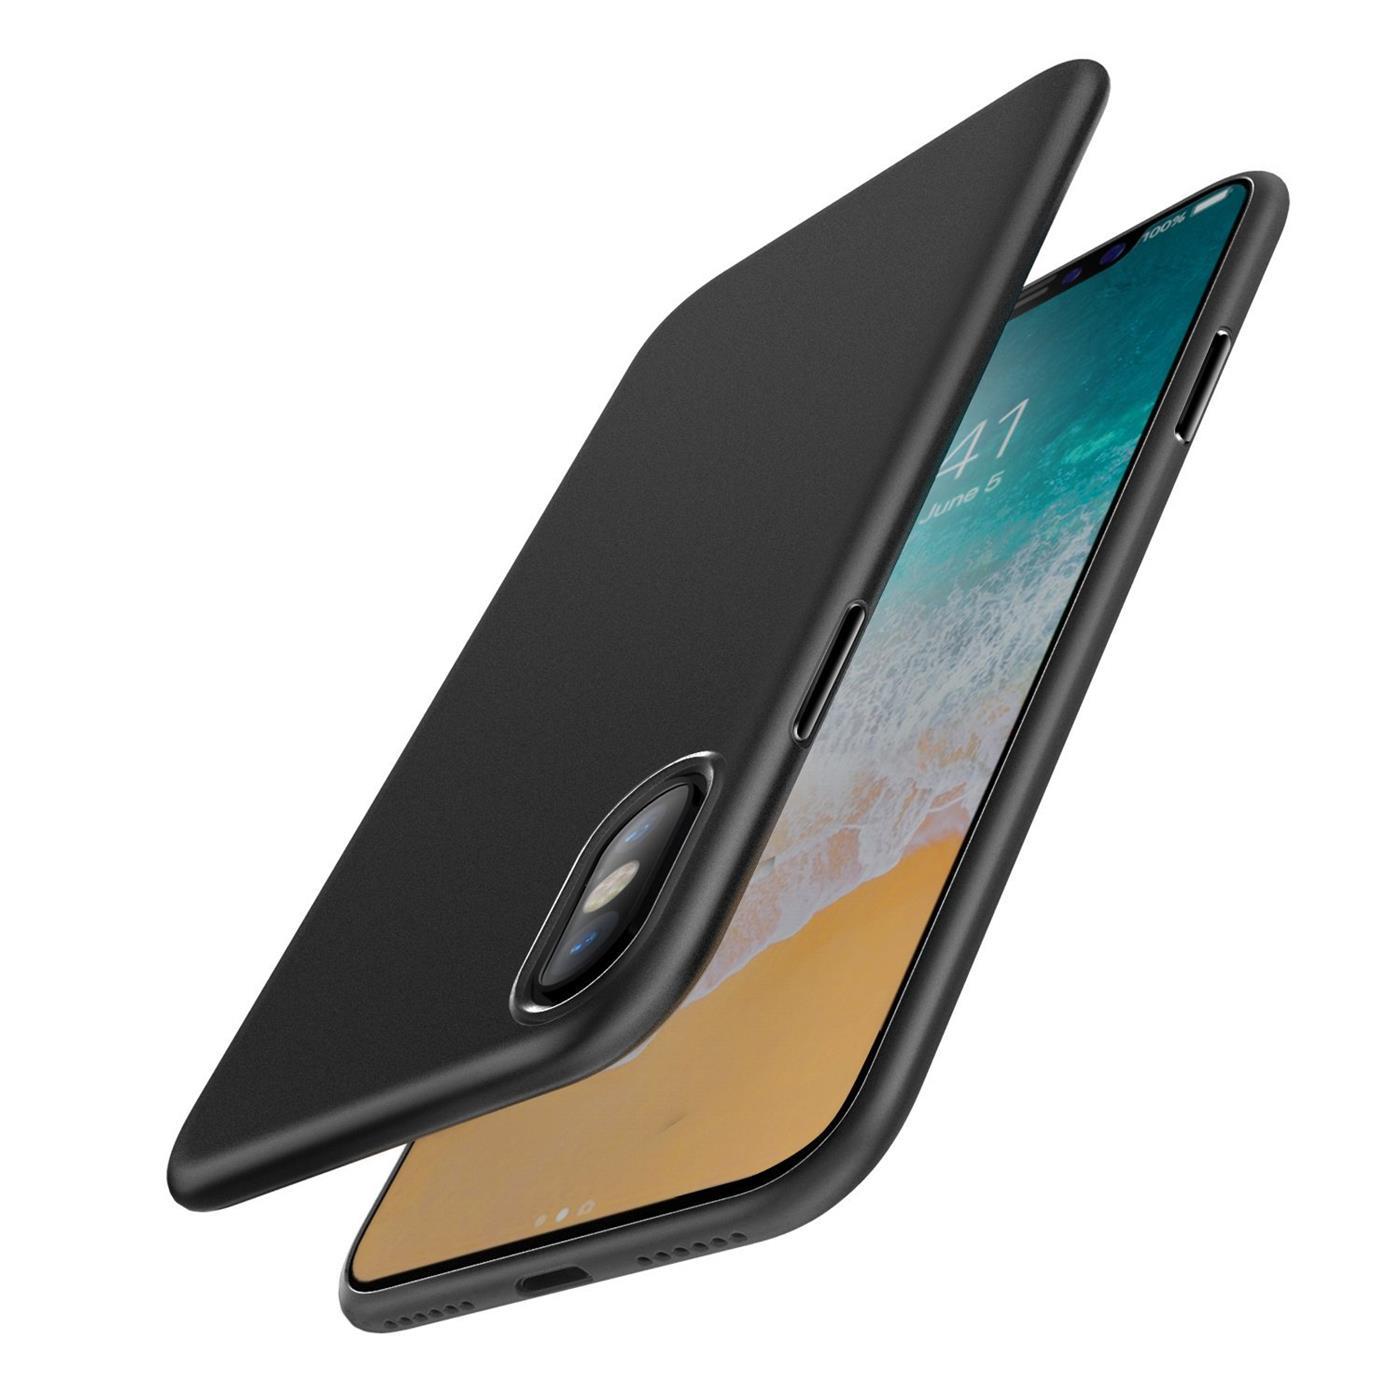 Slim Silikon Case Apple iPhone Schutzhülle Bumper TPU Cover Handyhülle Schwarz